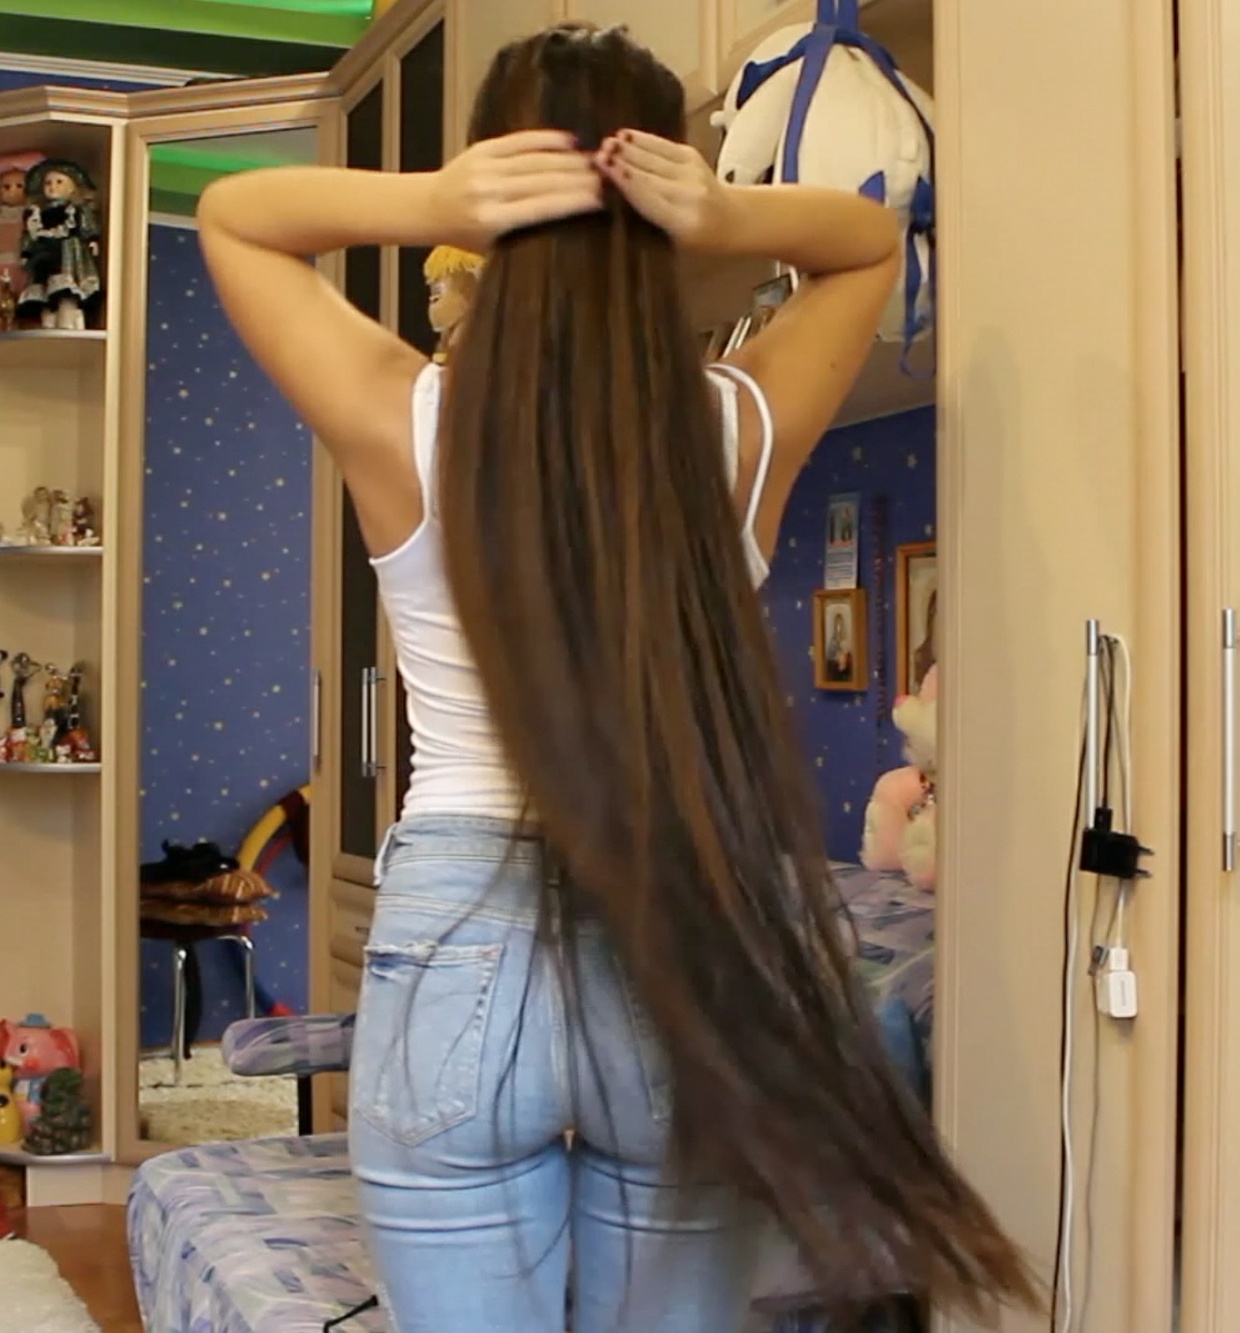 VIDEO - Diana´s hair drying